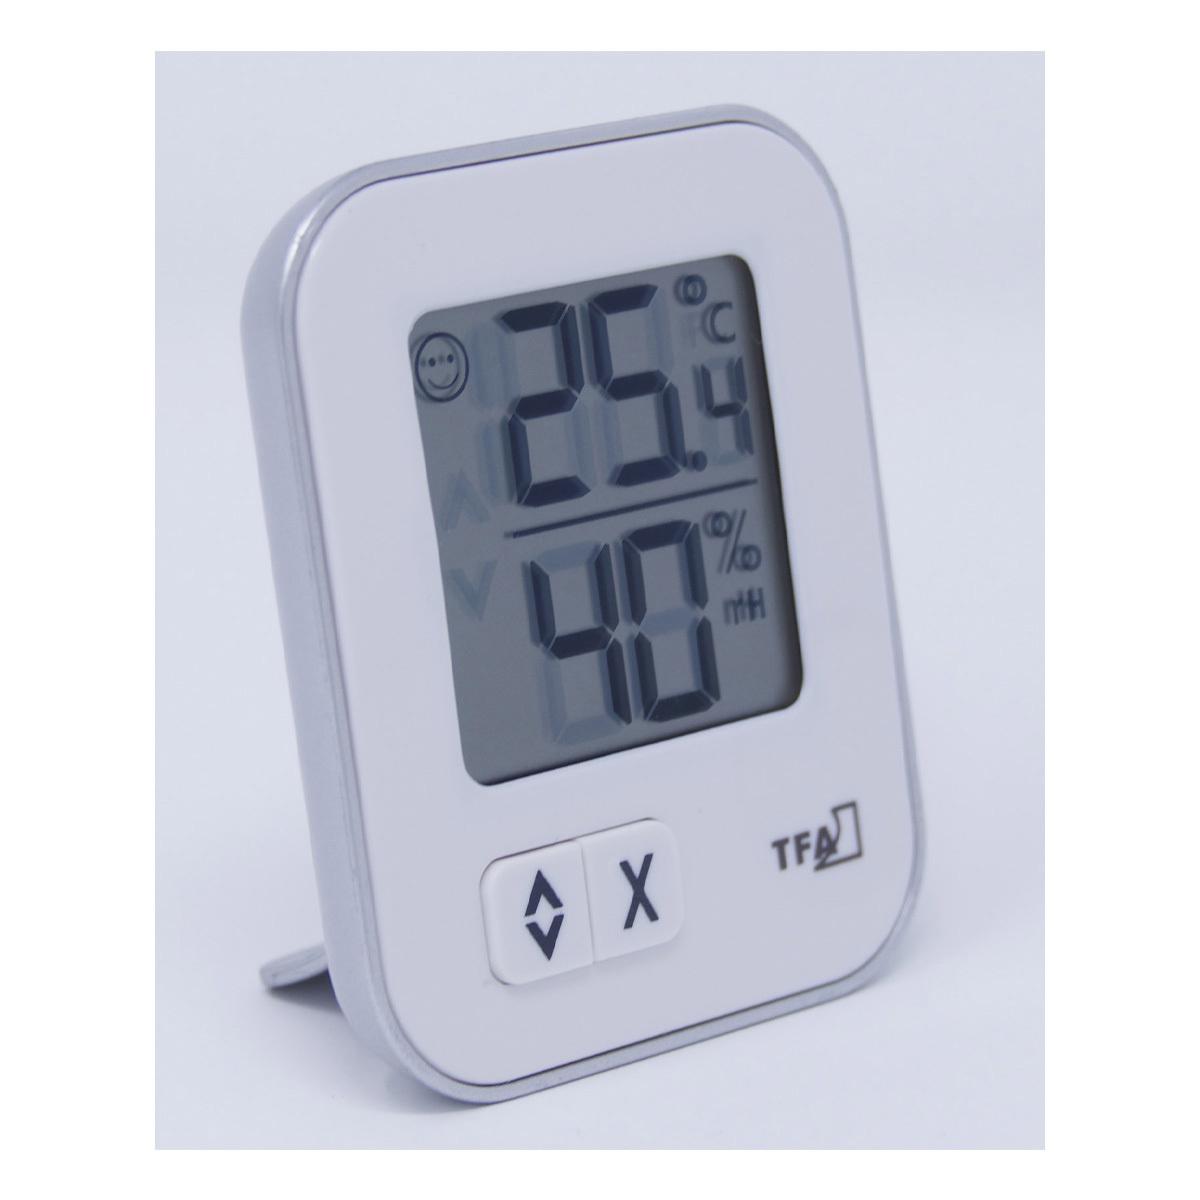 30-5026-02-digitales-thermo-hygrometer-moxx-ansicht-1200x1200px.jpg